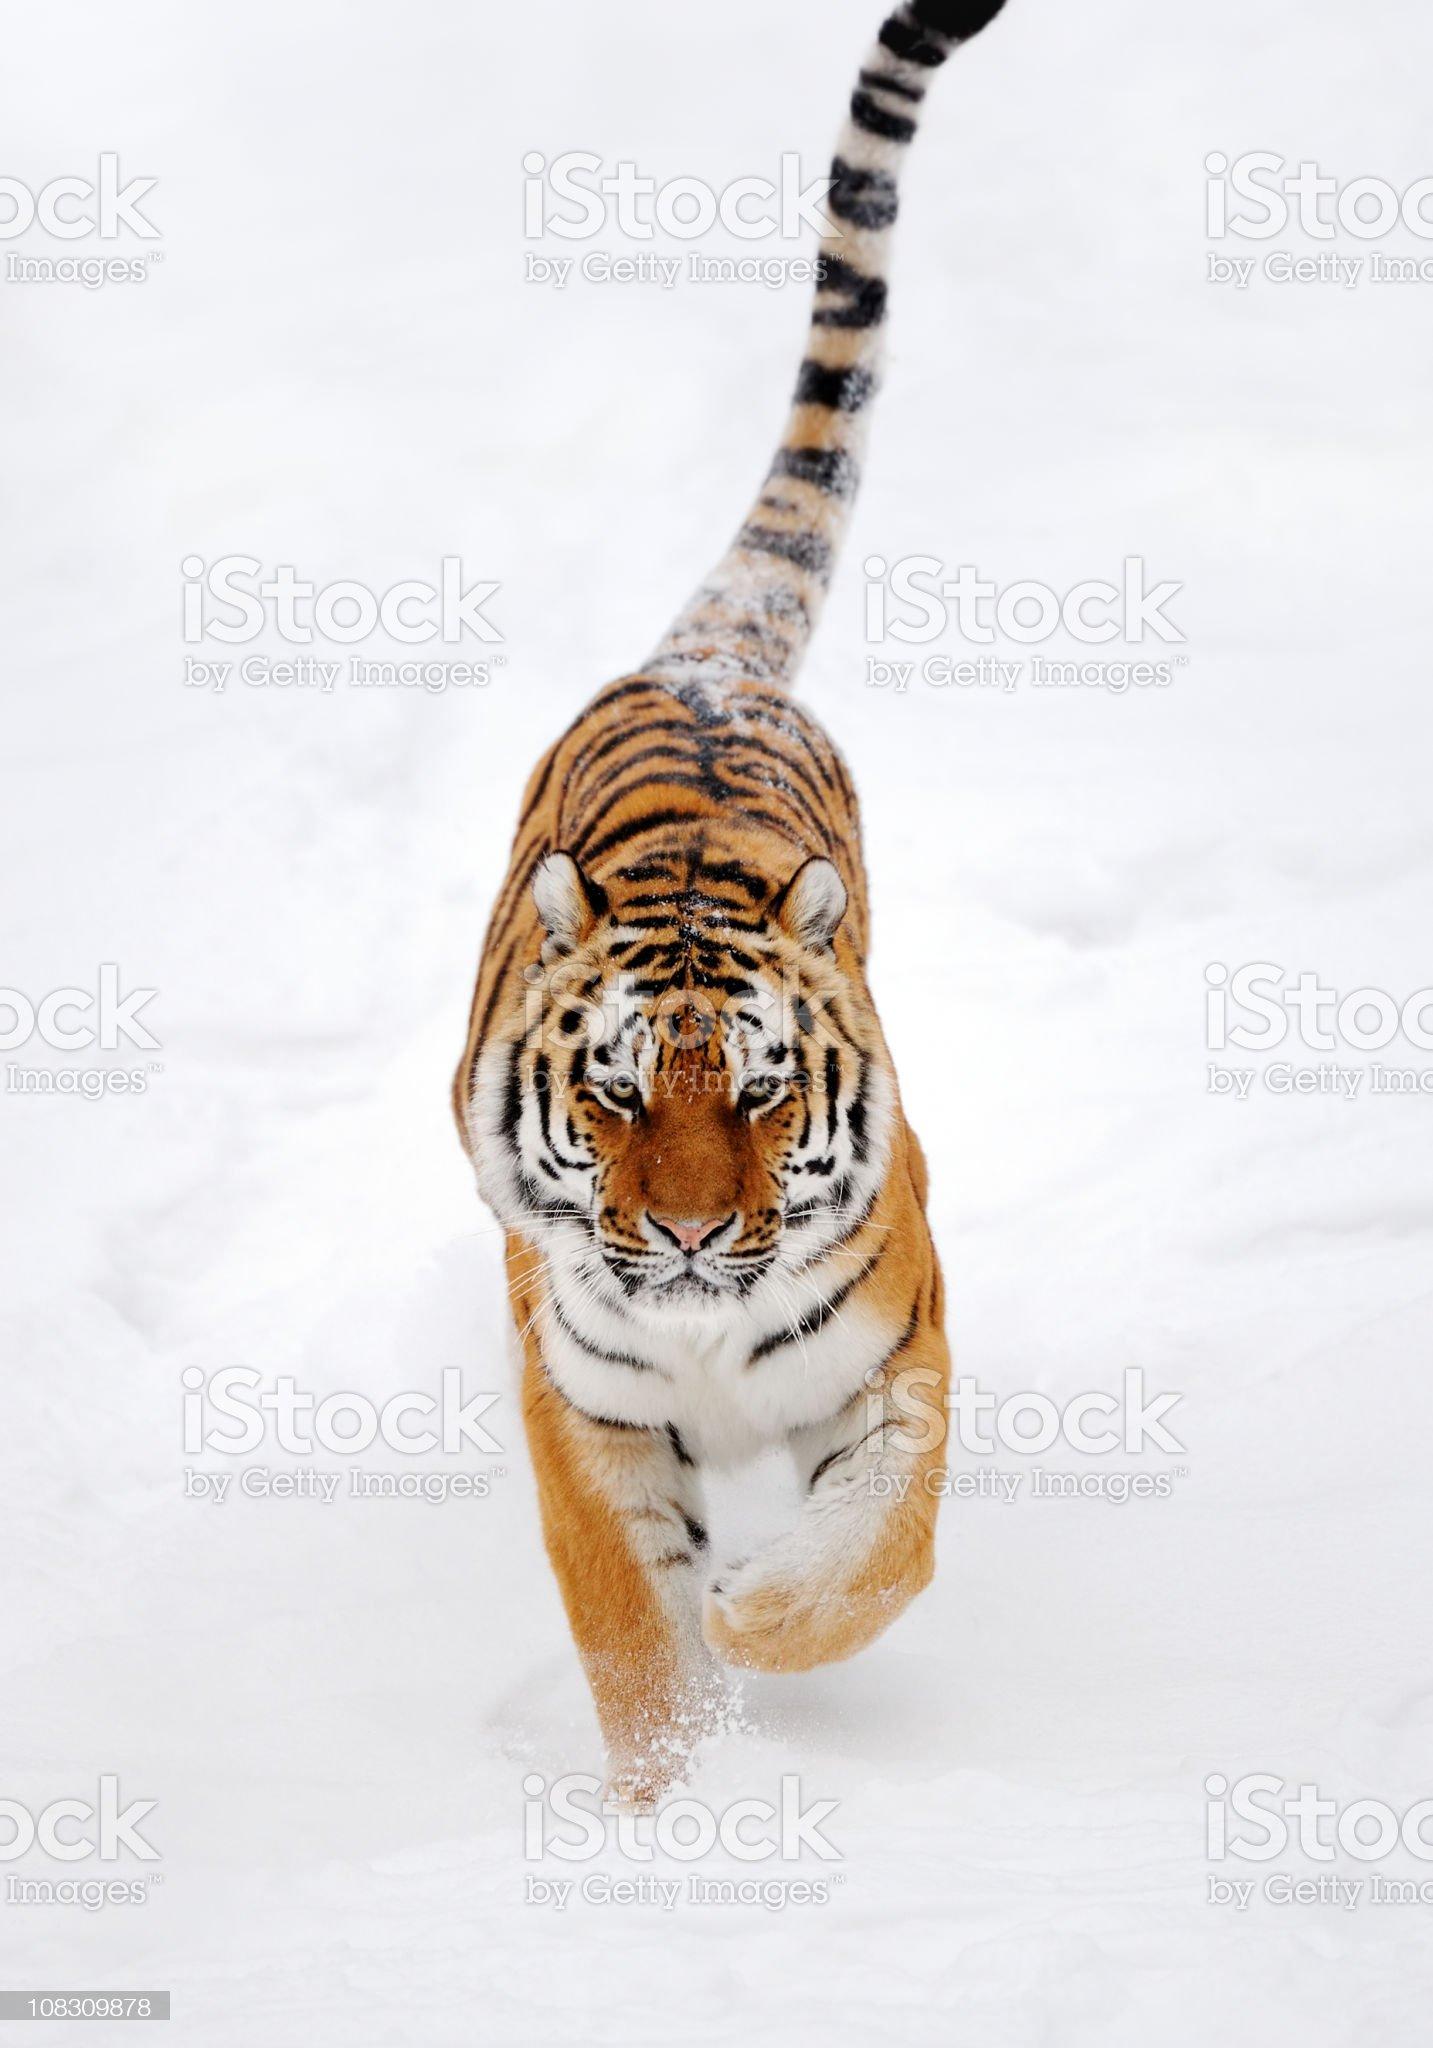 running tiger royalty-free stock photo